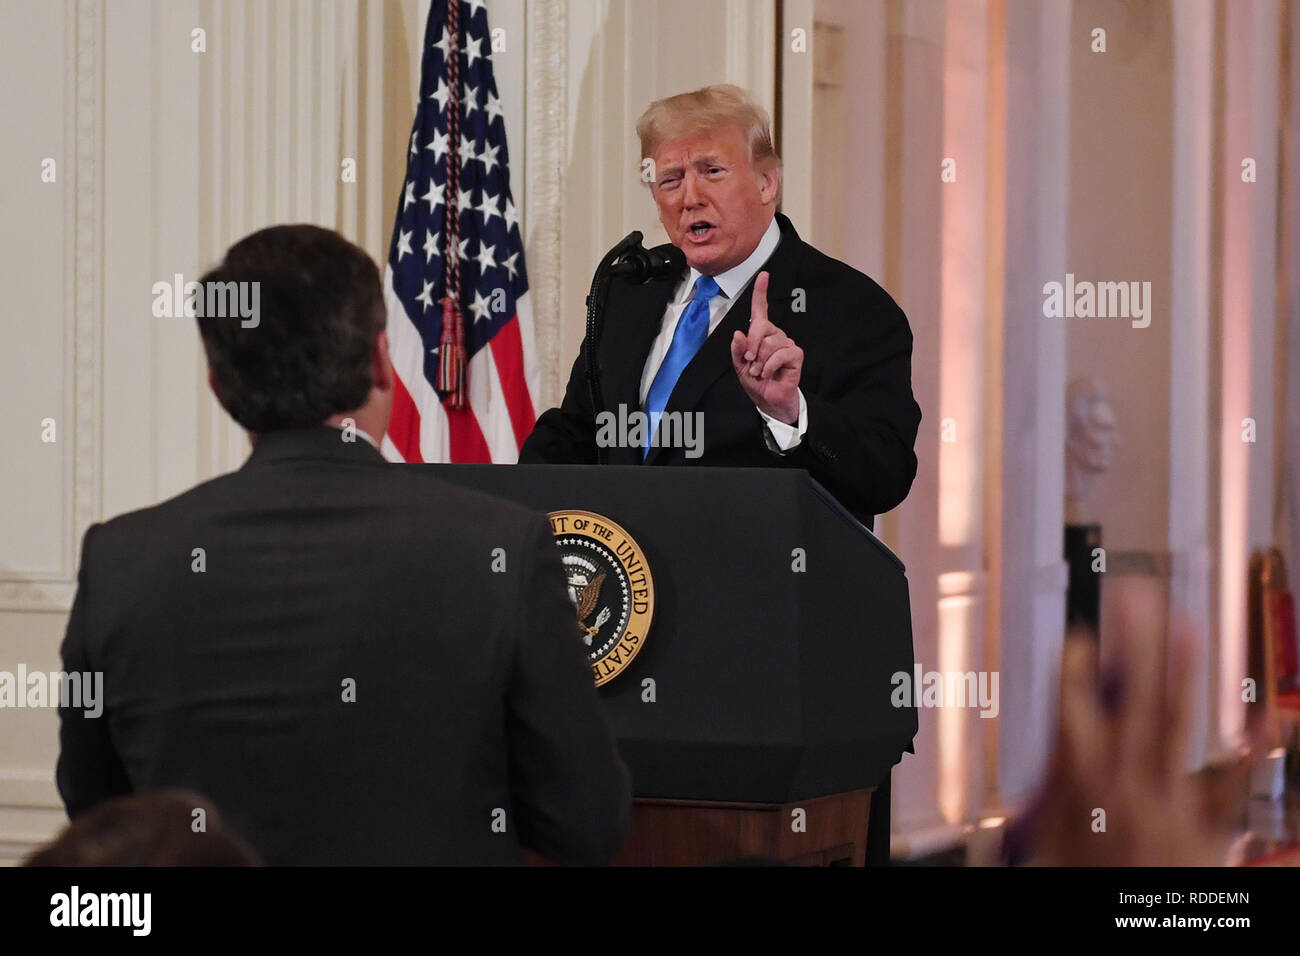 Washington, District de Columbia, Etats-Unis. 20 Nov, 2018. Donald Trump, président de Etats-unis, discute con Jim Acosta, periodista de CNN, en la Sala Este de la Casa Blanca el 7 de noviembre de 2018. Credit: Christy Bowe/Globe Photos Via Zuma Zuma/TNS/fil Wire/Alamy Live News Photo Stock